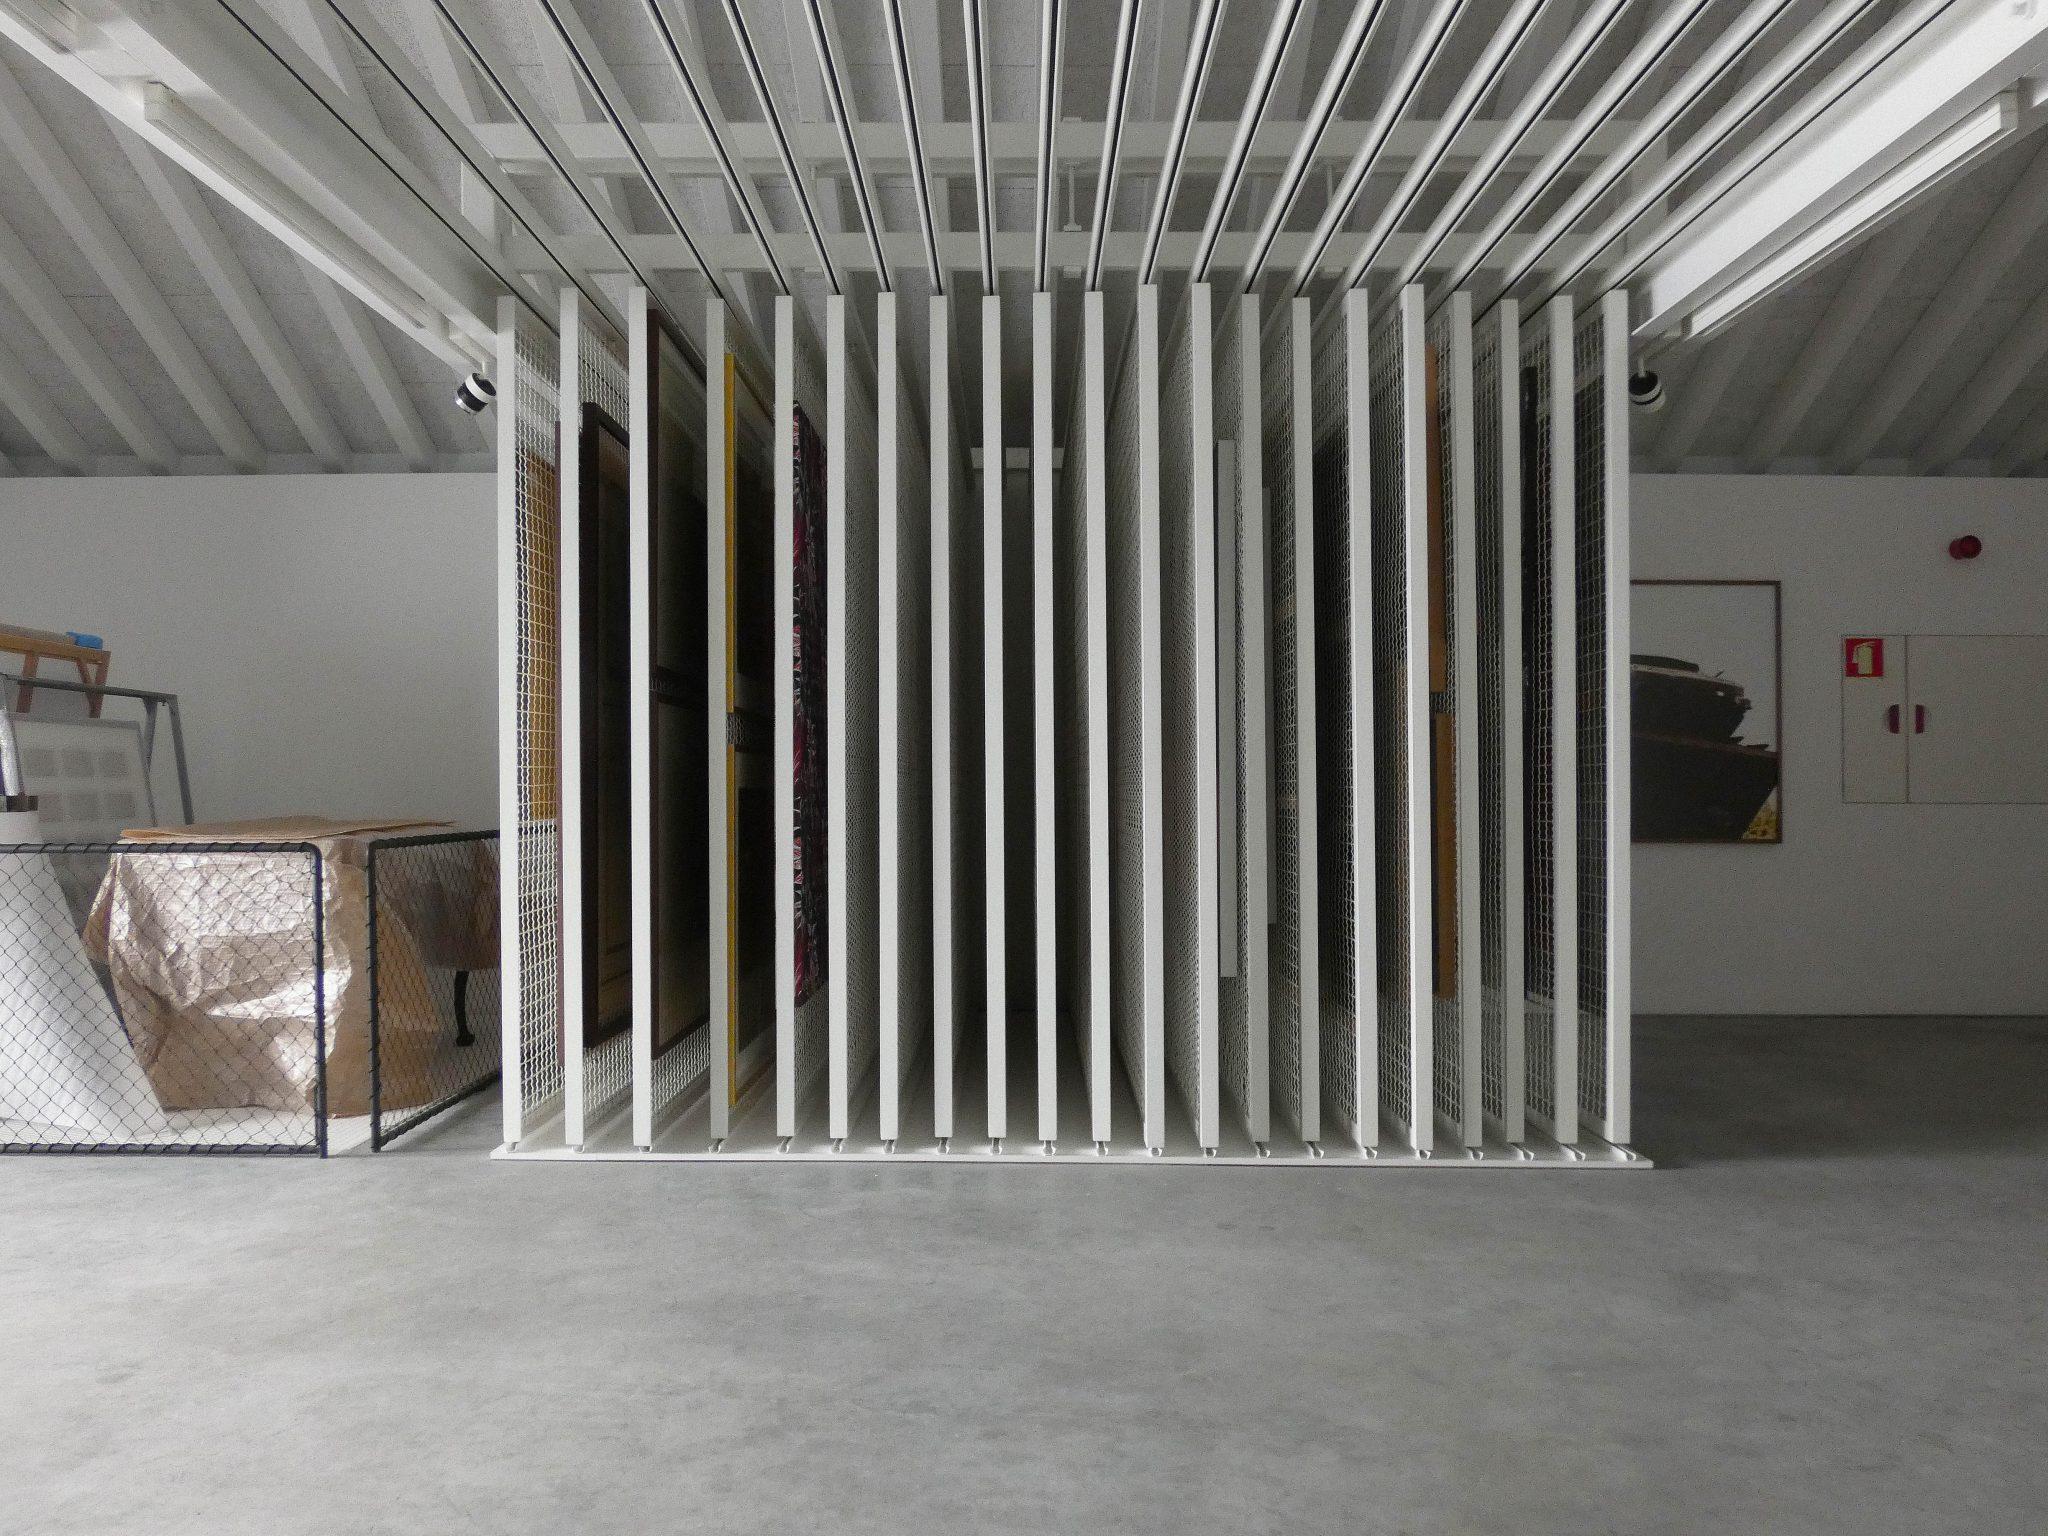 Exposição de Adrien Missika, Demain, Stabilisation Galeria Francisco Fino